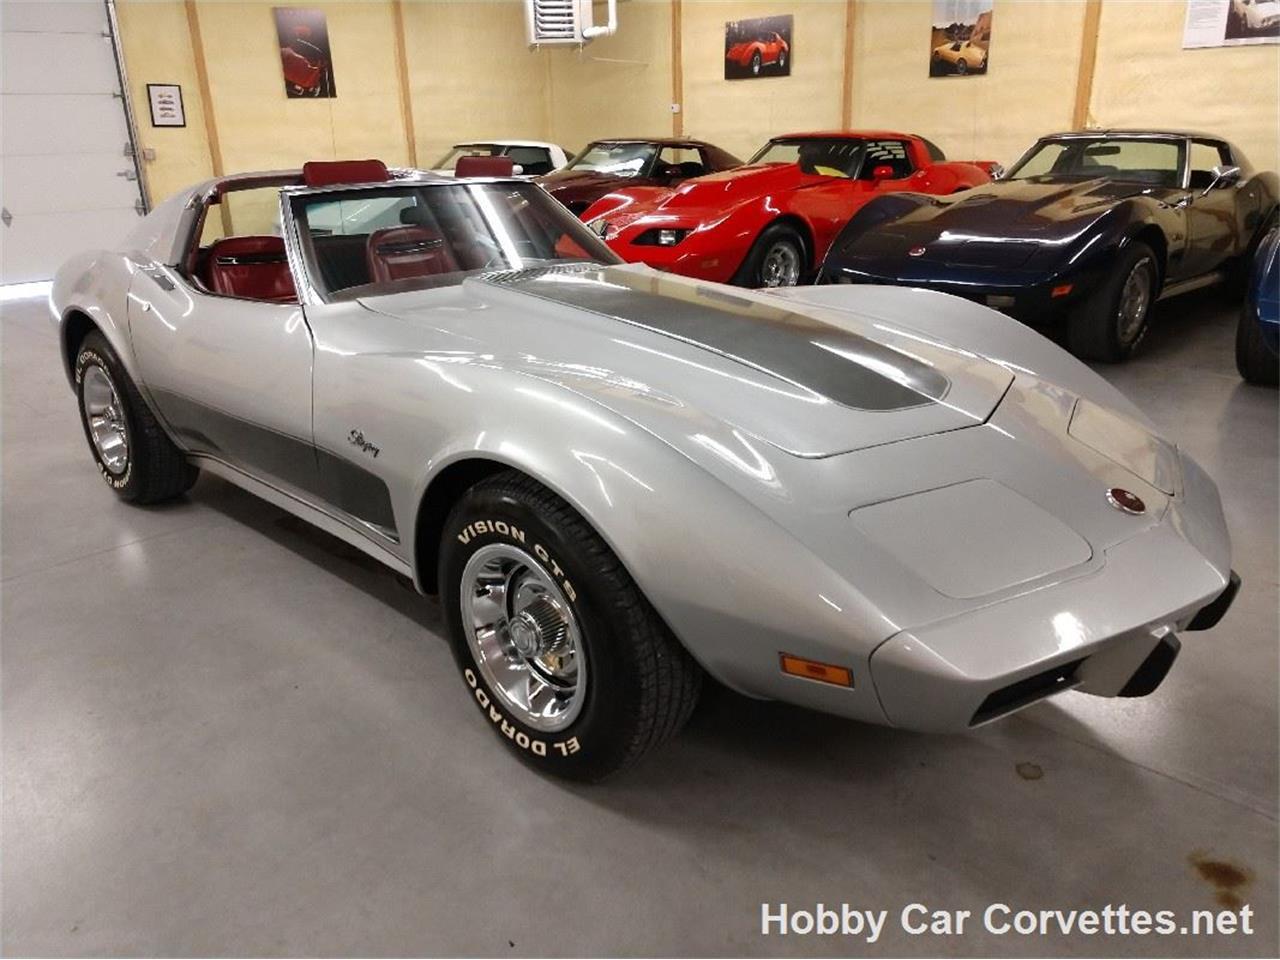 1975 Chevrolet Corvette (CC-1258527) for sale in martinsburg, Pennsylvania